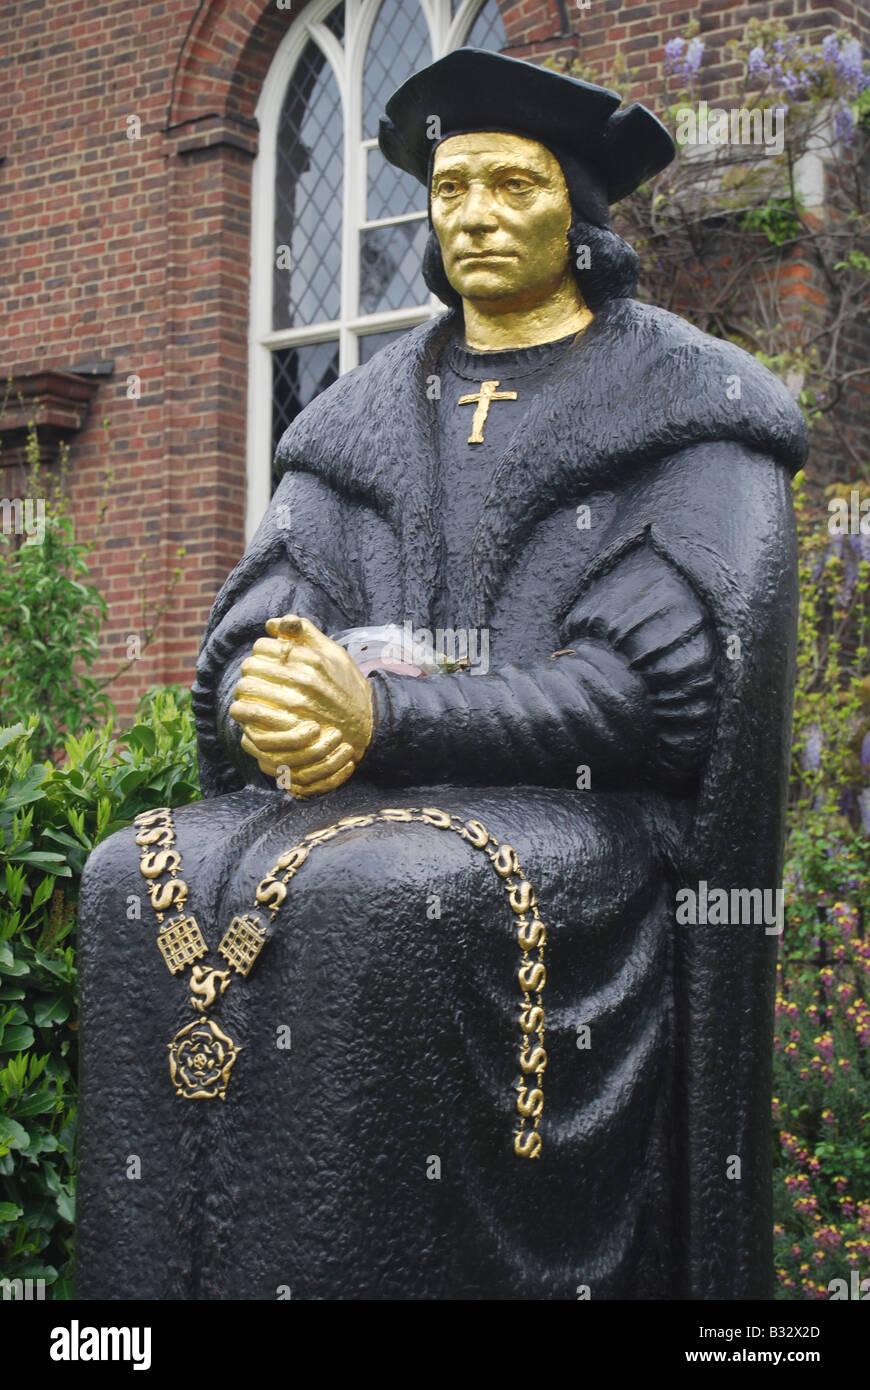 'Sir Thomas More' - Stock Image